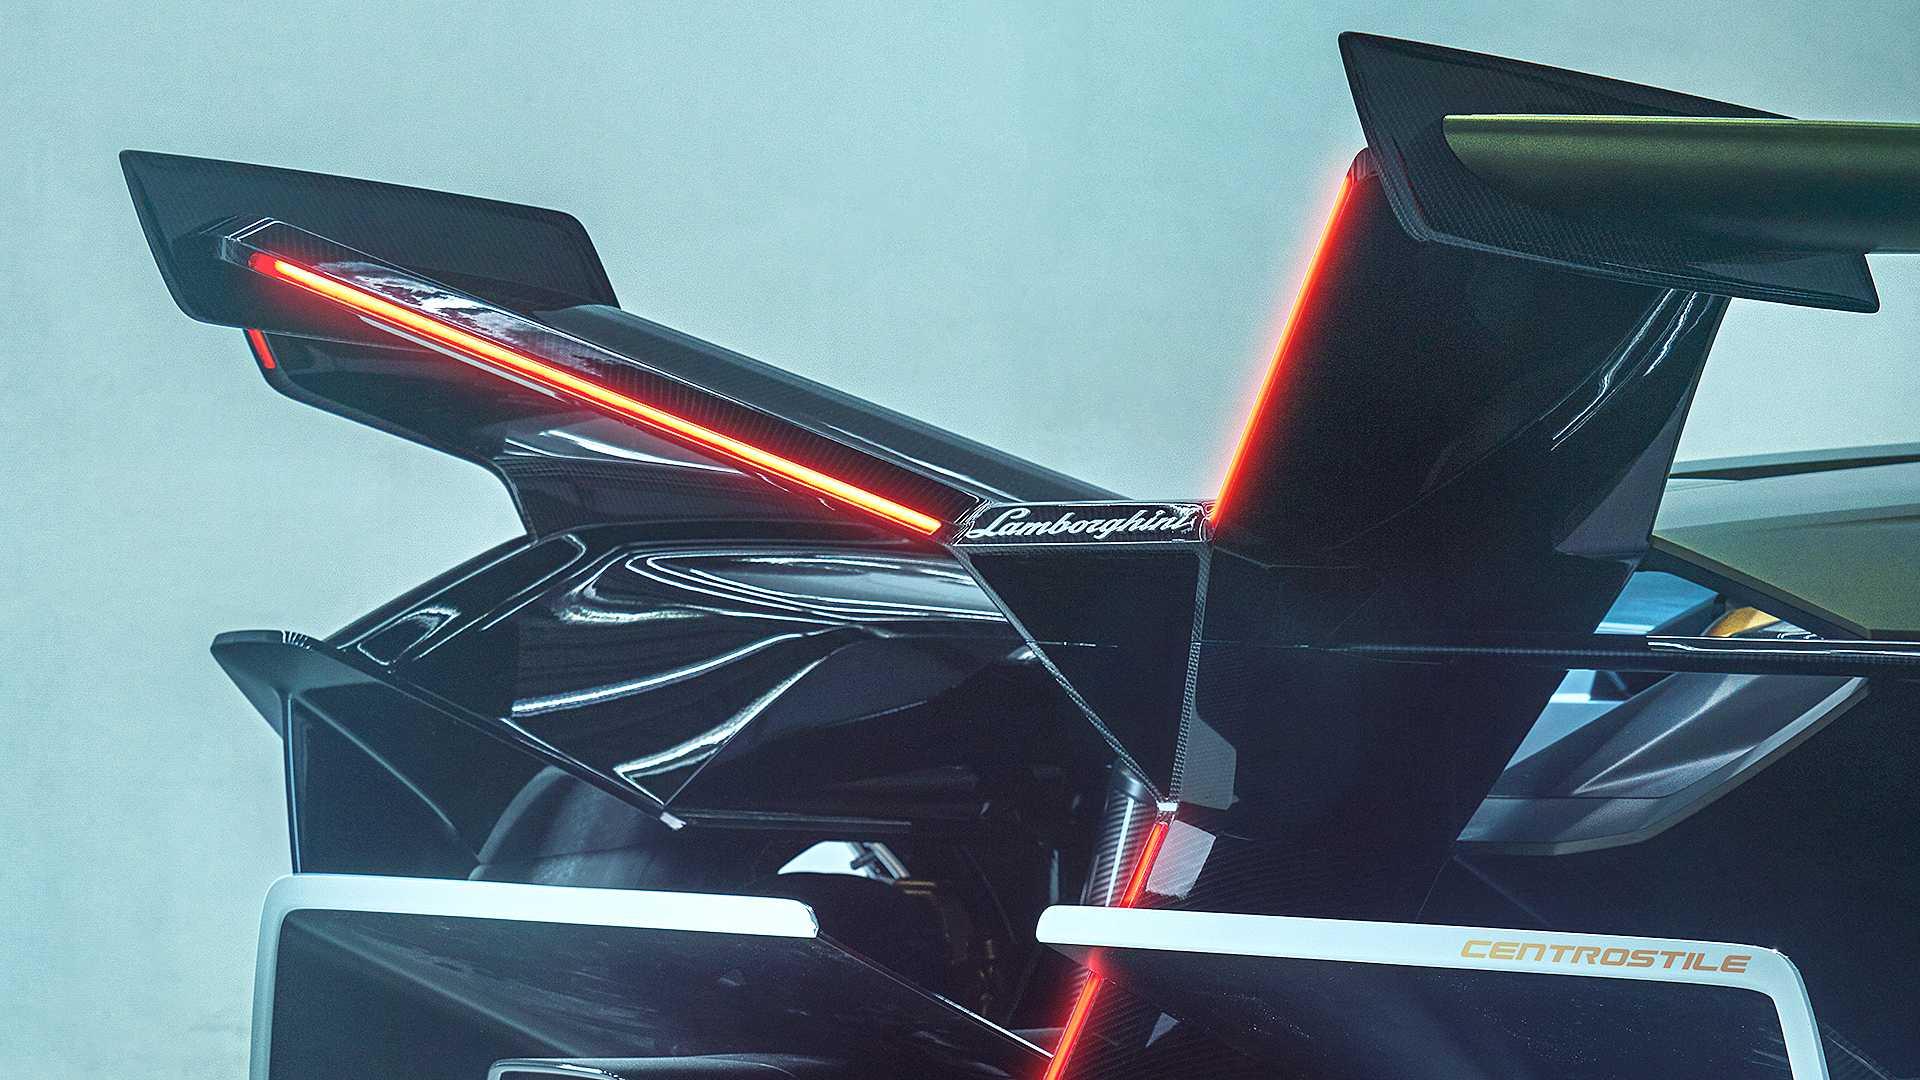 Lamborghini-V12-Vision-Gran-Turismo-12